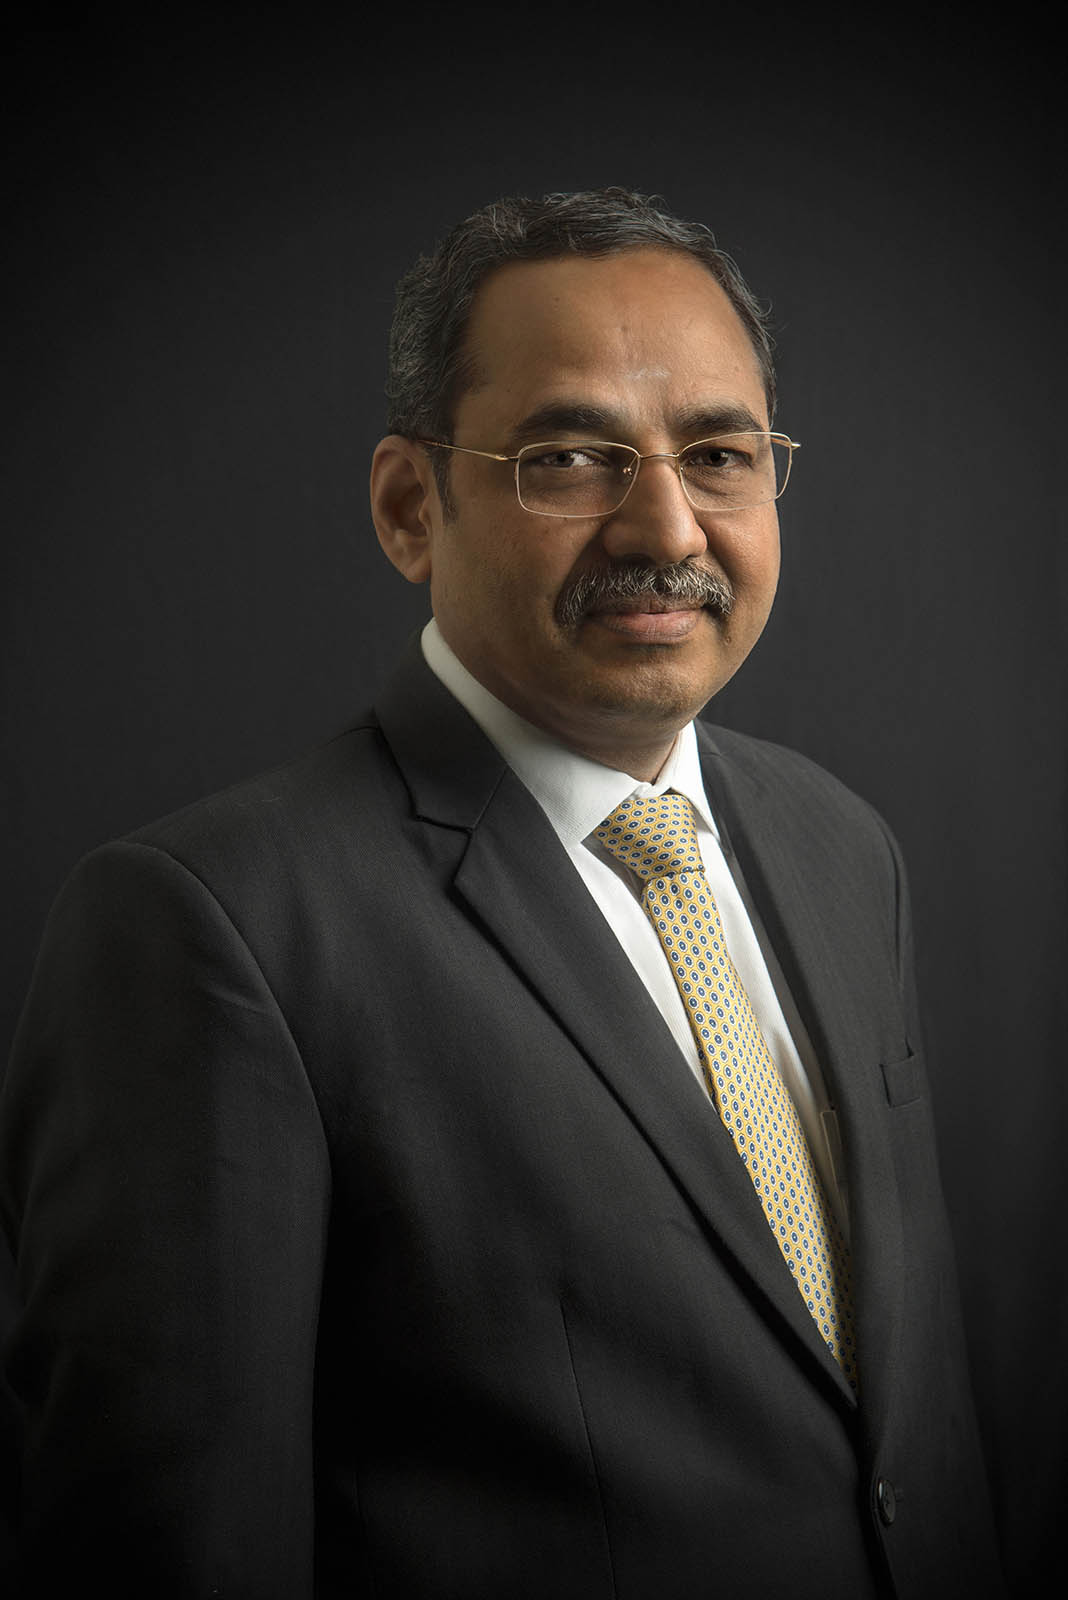 Mr. A Balasubramaniam, CEO, Aditya Birla Sun Life AMC Ltd.